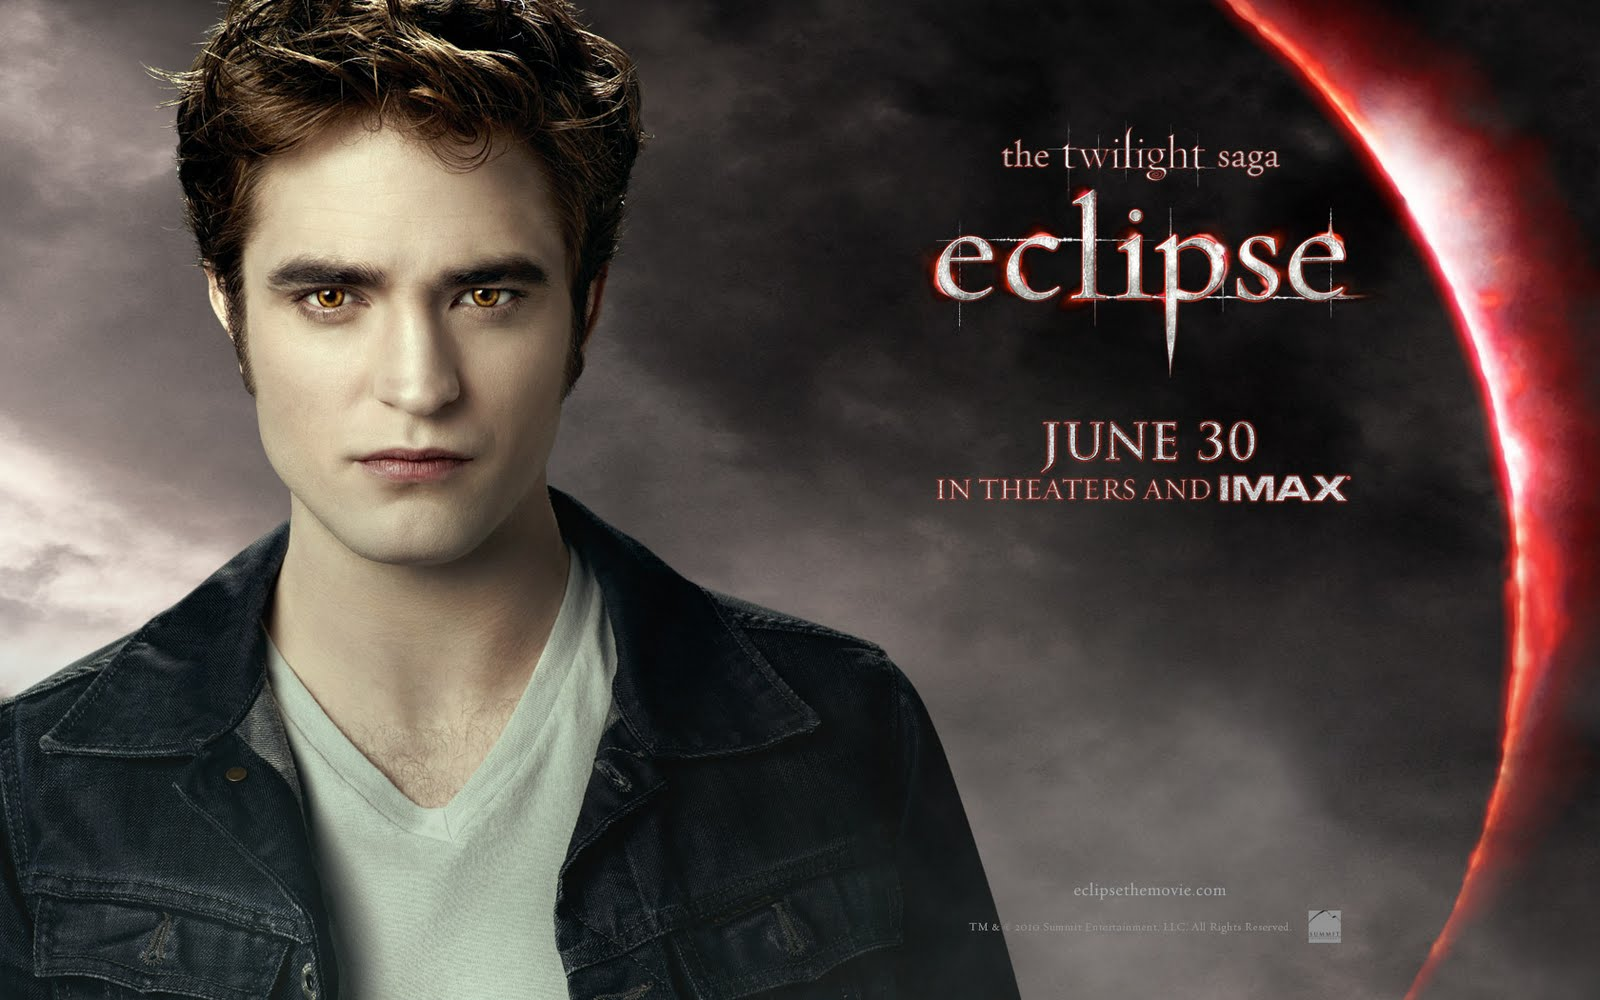 http://4.bp.blogspot.com/_Ey3ixqV9VPc/S-450aWSHOI/AAAAAAAAD44/16ZTcEHIrnA/s1600/Edward.jpg